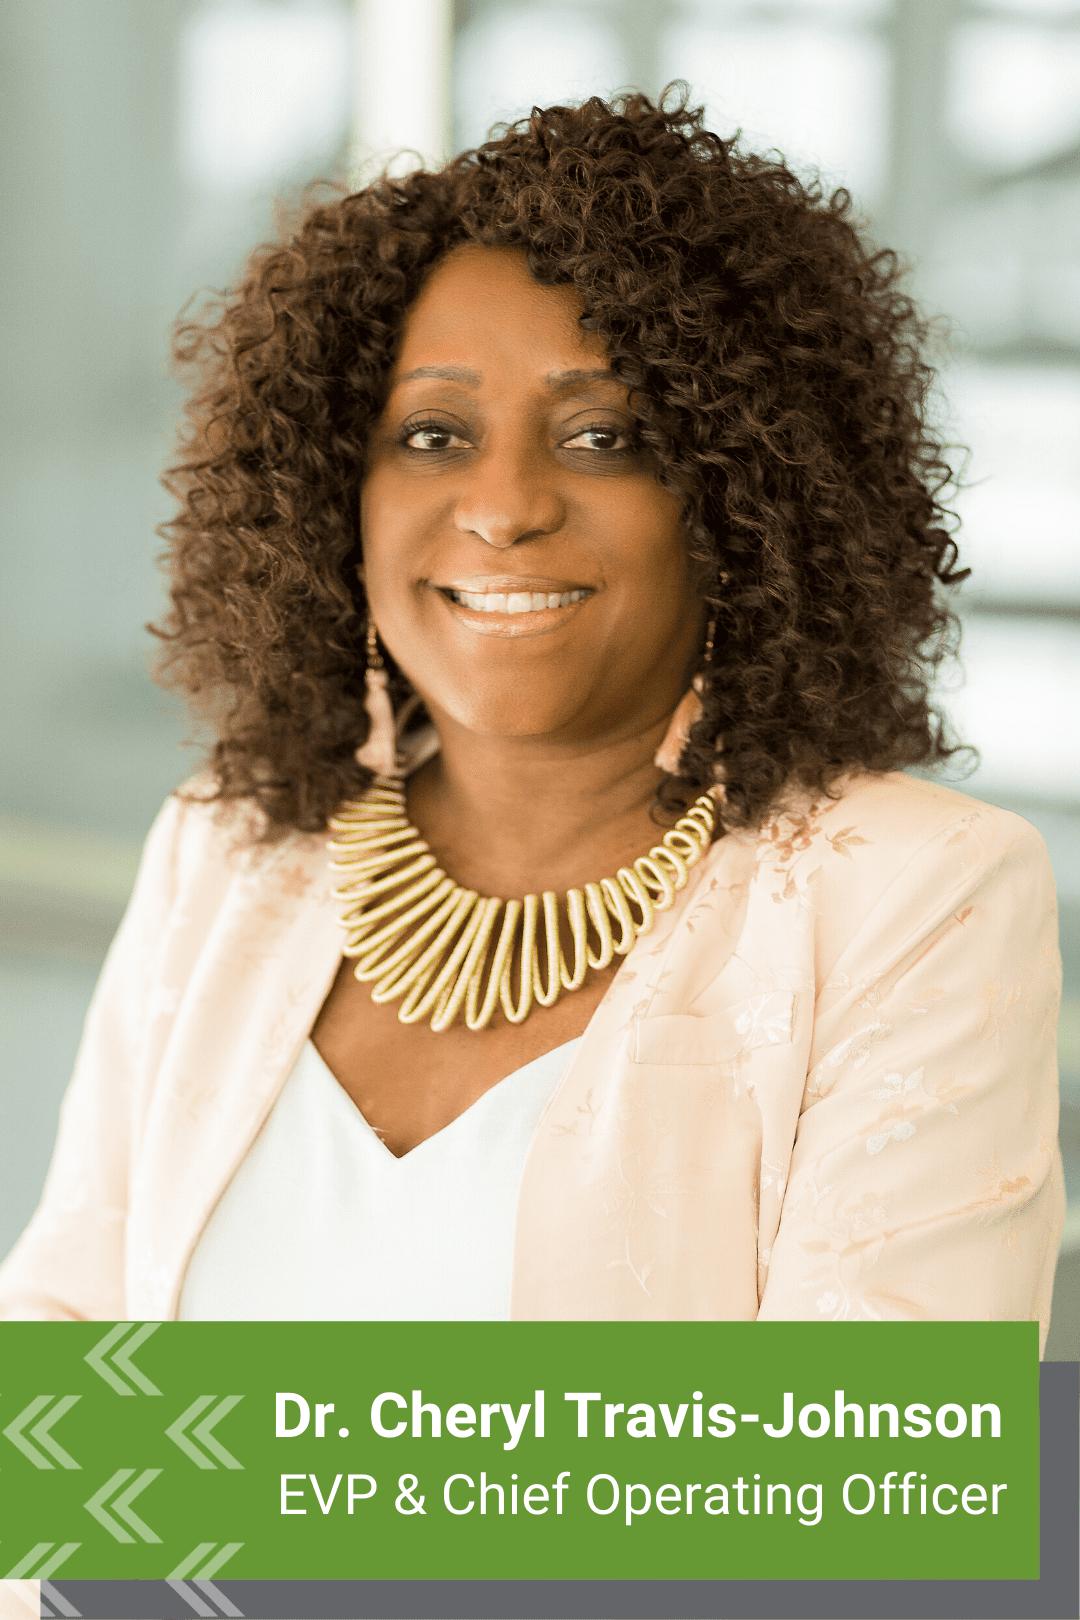 Cheryl Travis-Johnson, EVP & Chief Operating Officer